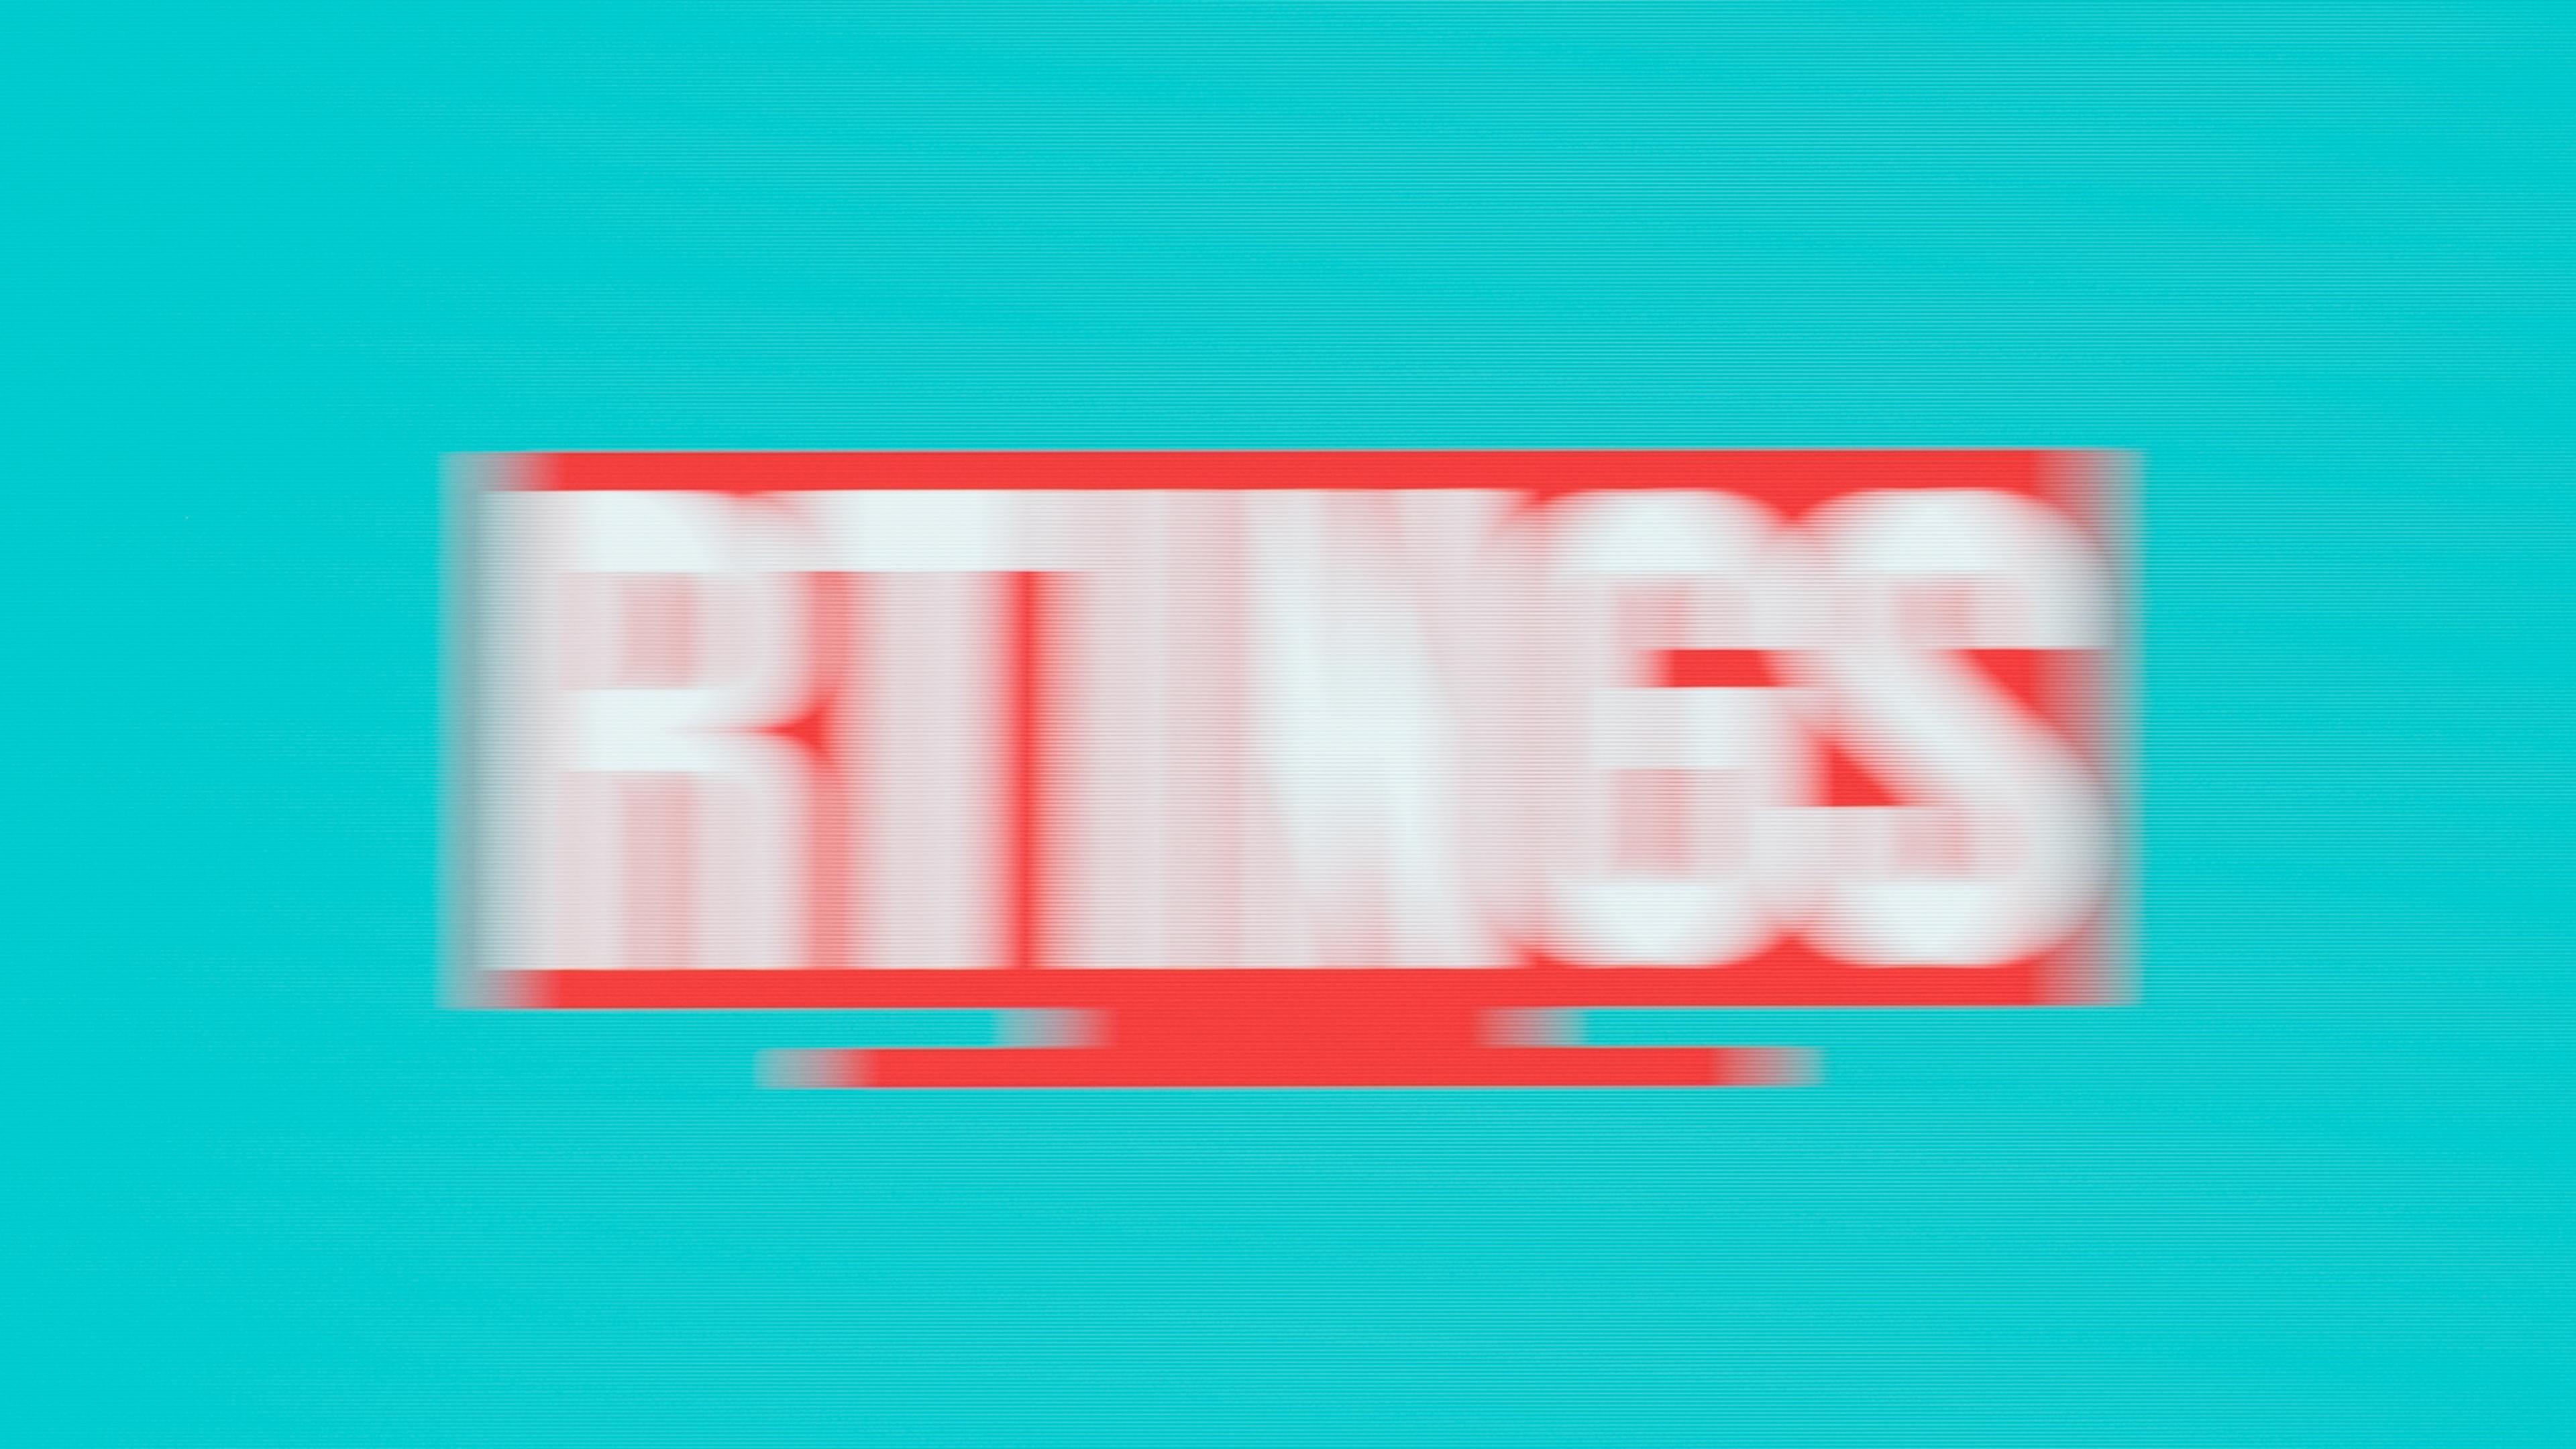 Motion Blur Of TVs - RTINGS com